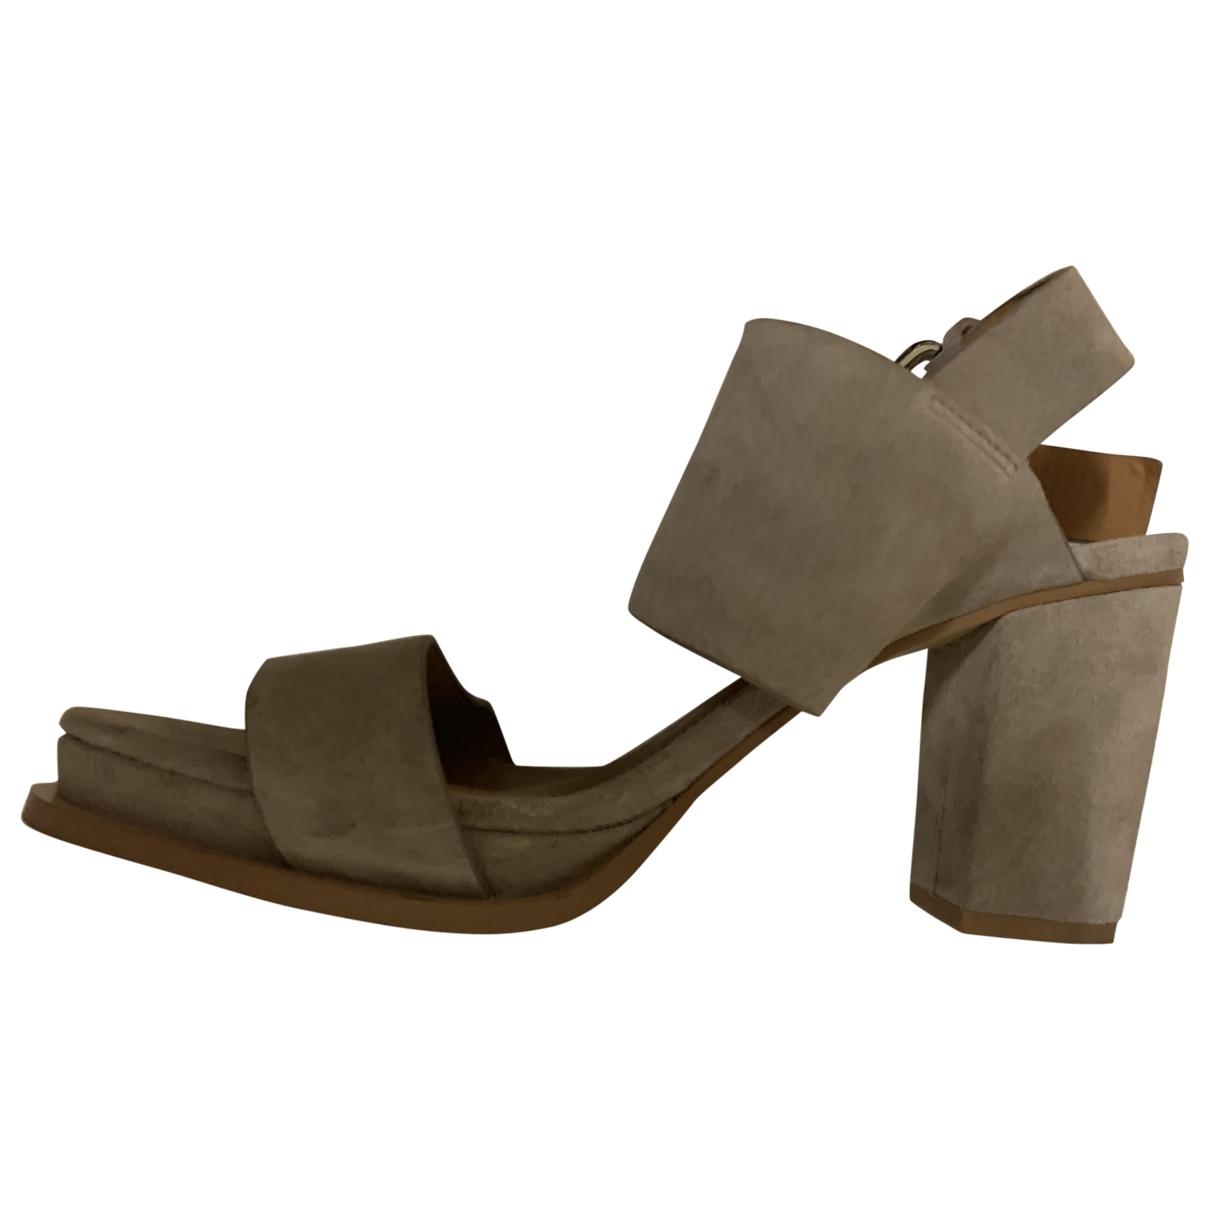 & Stories \N Grey Suede Sandals for Women 39 EU